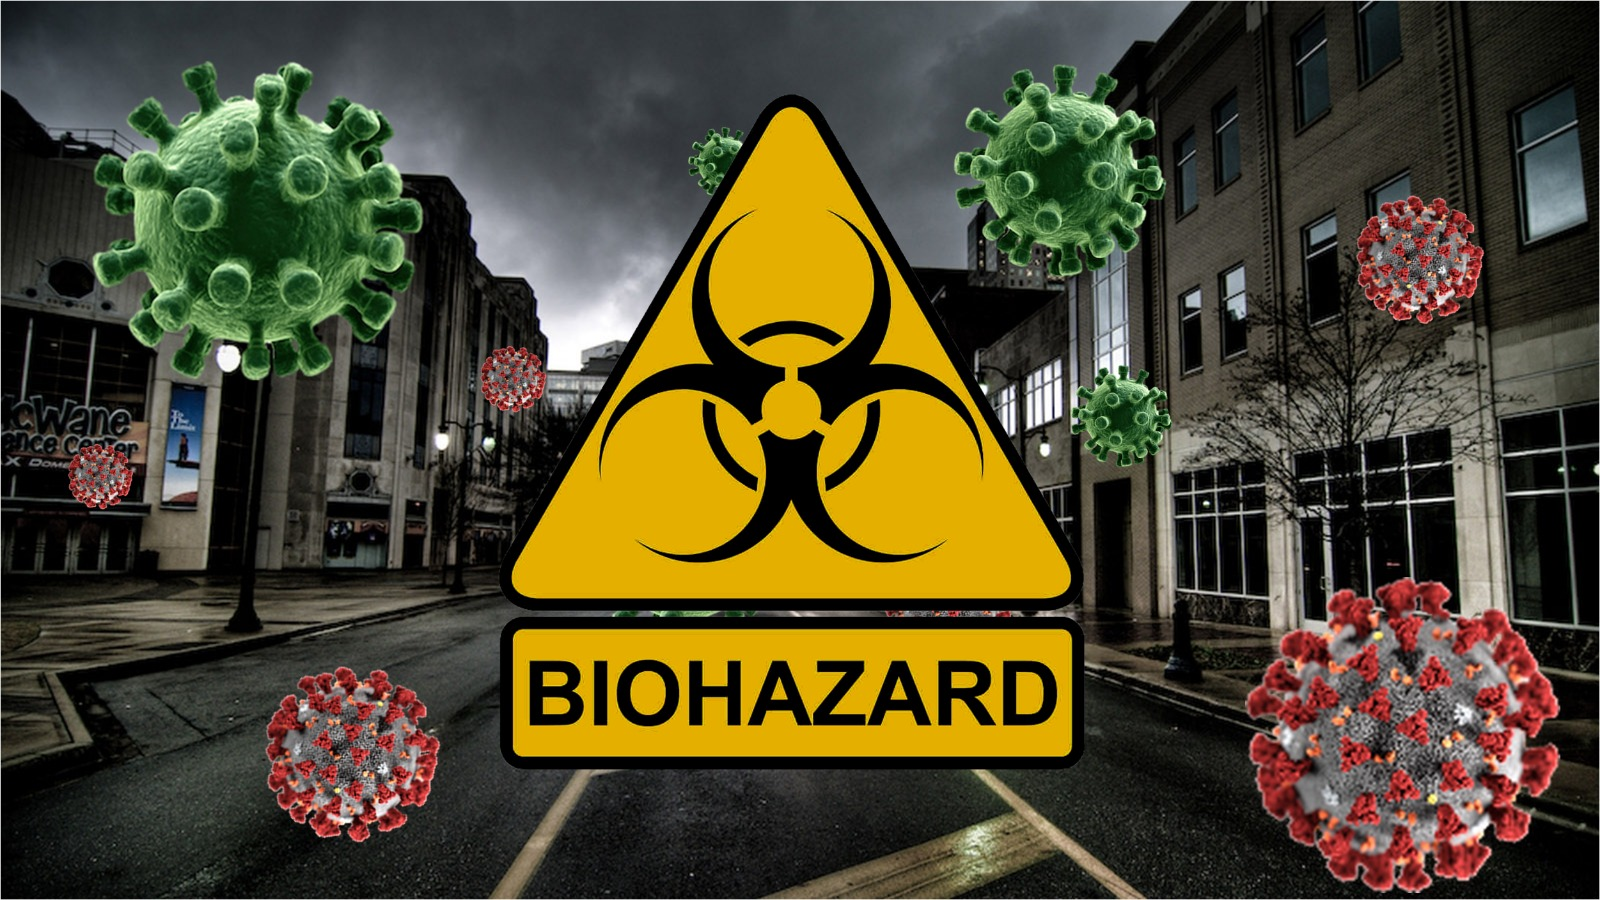 coronavirus - pandemia - epidemia -laboratorio de wuhan-conspiraciones-origen del virus-sars cov 2-covid 19-gripe - conspiraciones -virus de laboratorio